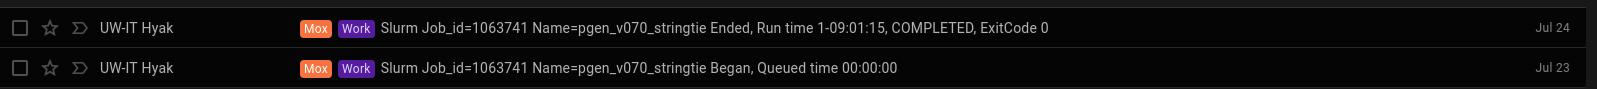 Screencap of Stringtie runtime for Pgenerosa_v070 on Mox